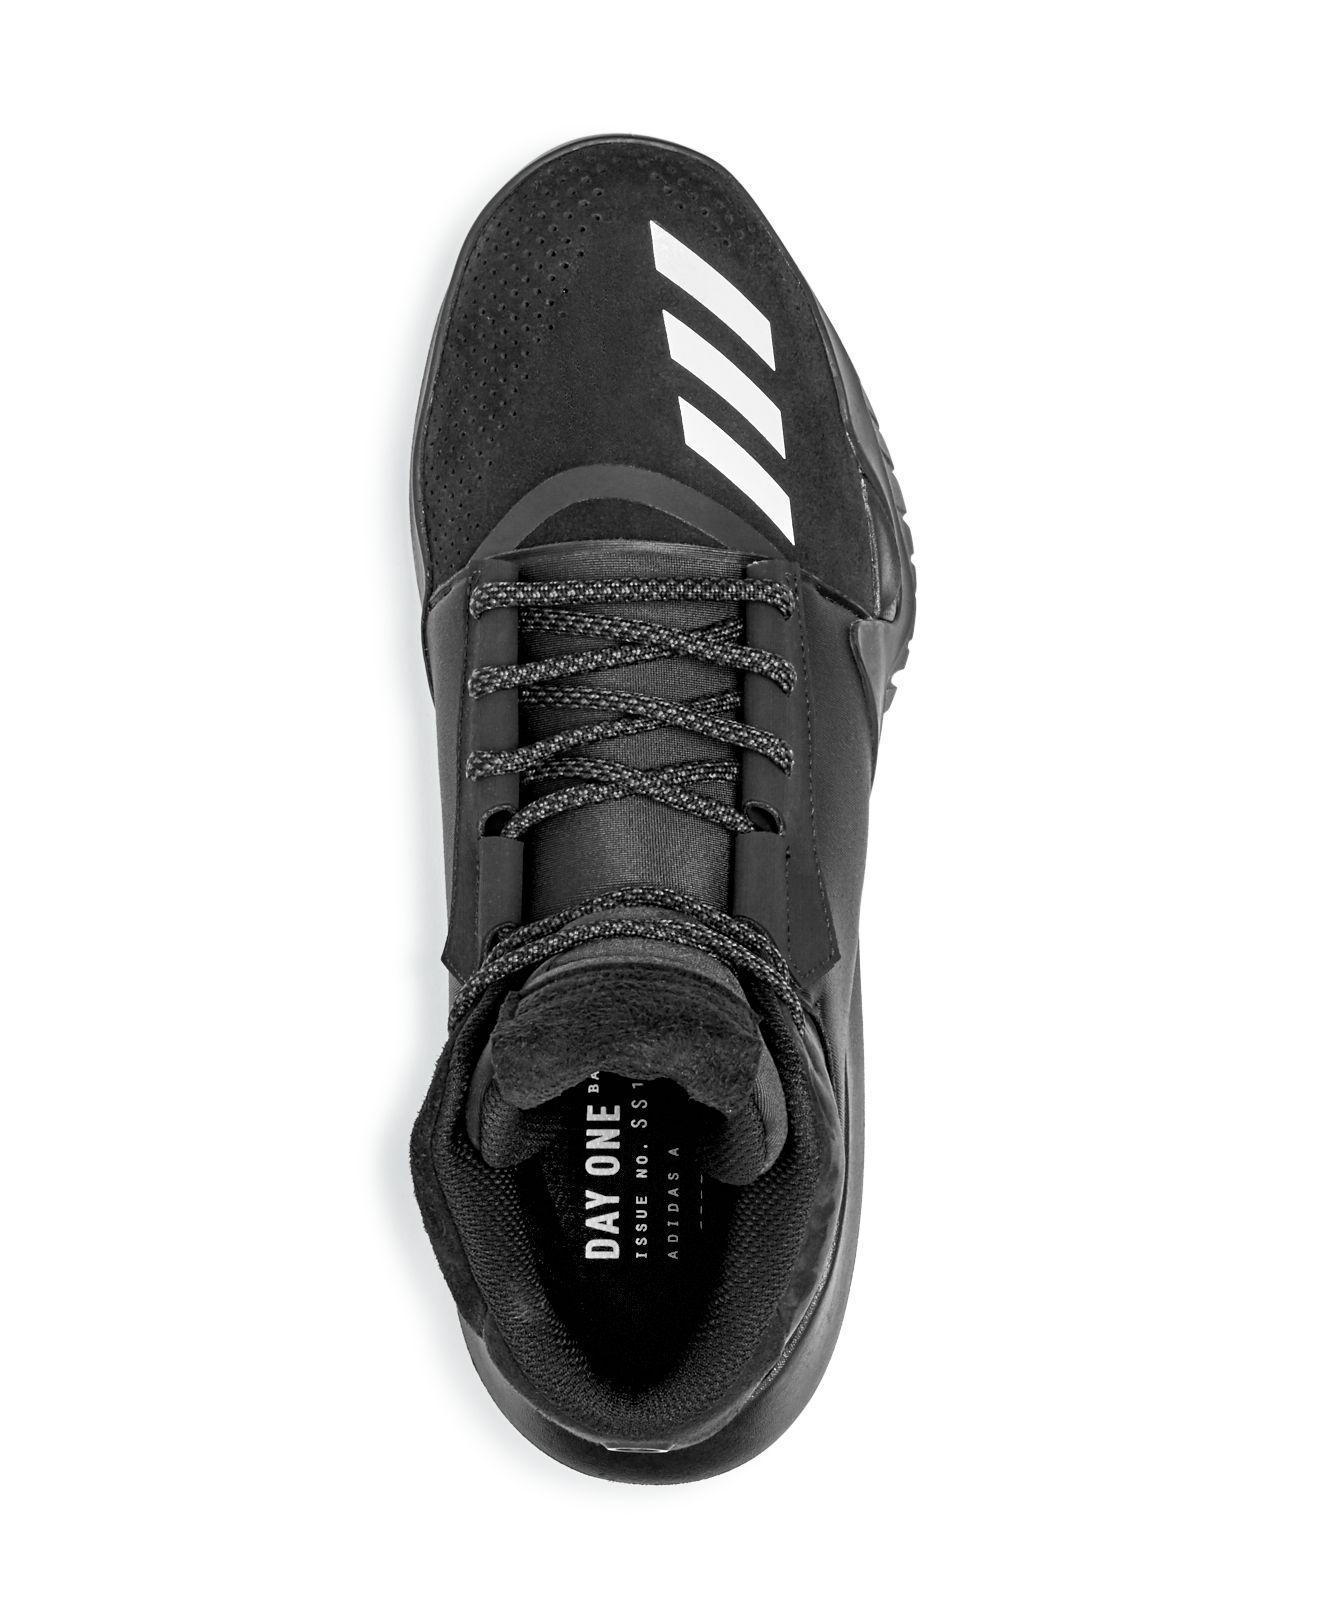 d7cfe707a adidas Originals Men s Ado Crazy Team High Top Sneakers in Black for ...